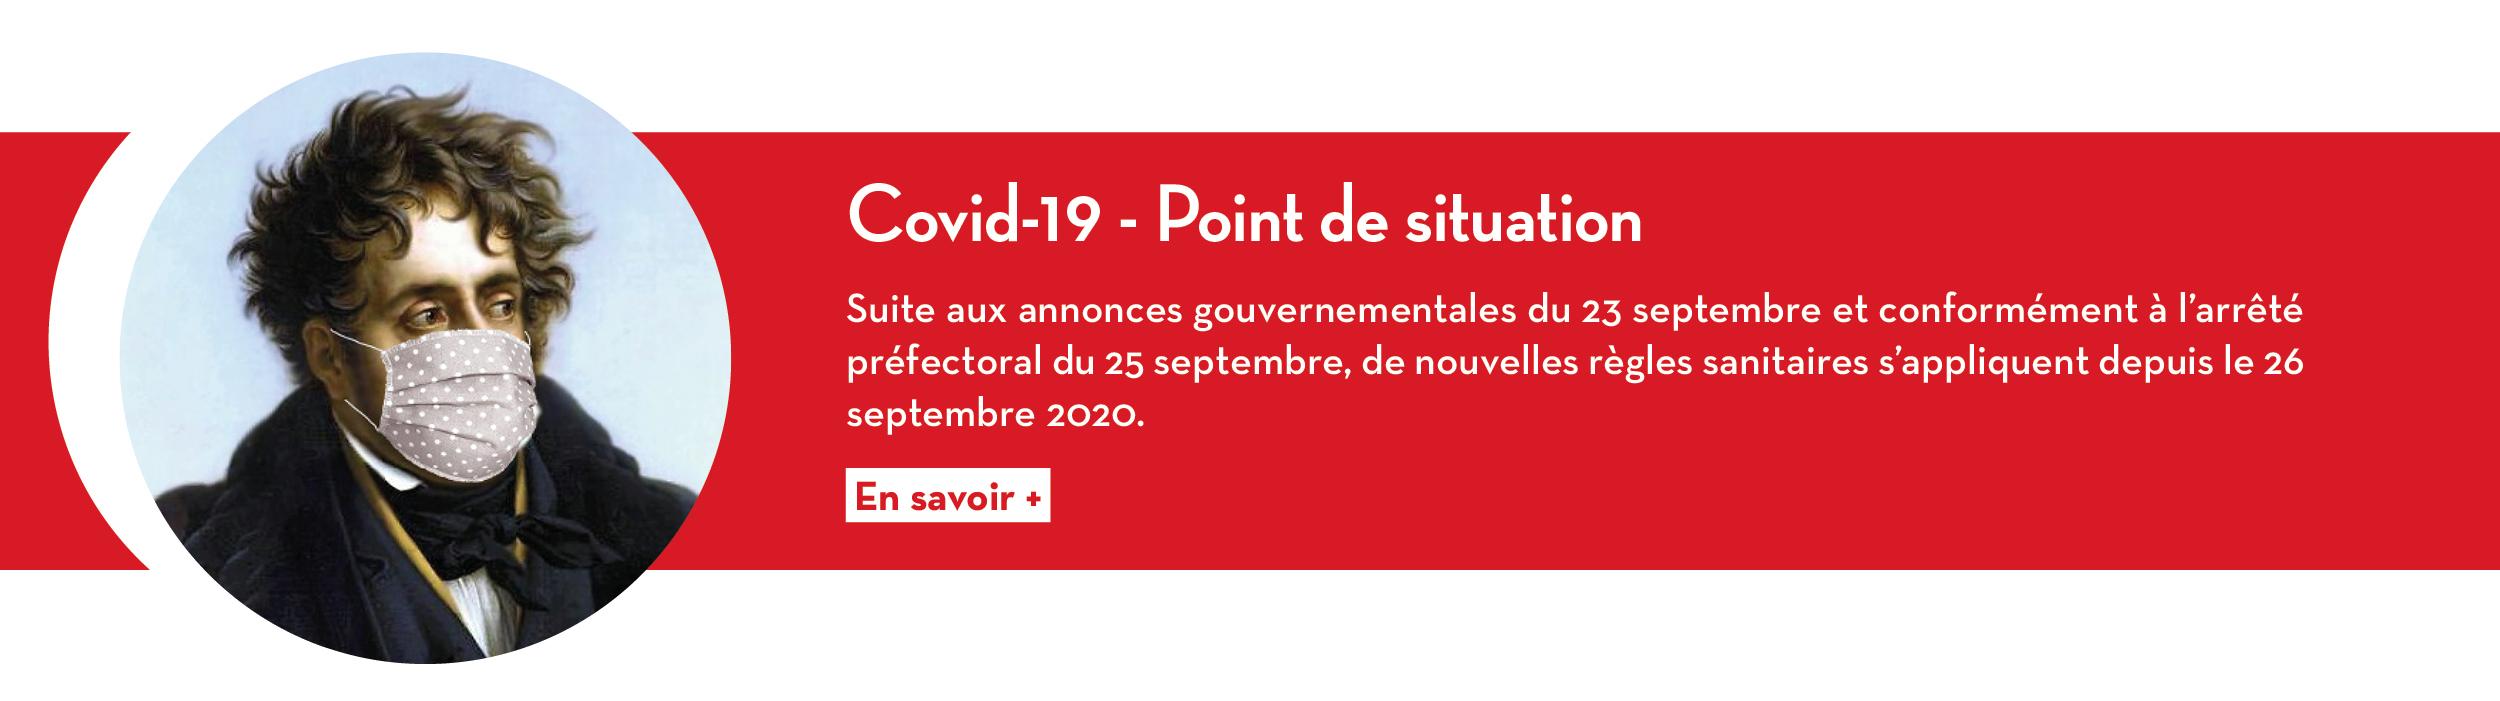 Covid-19 - Point de situation